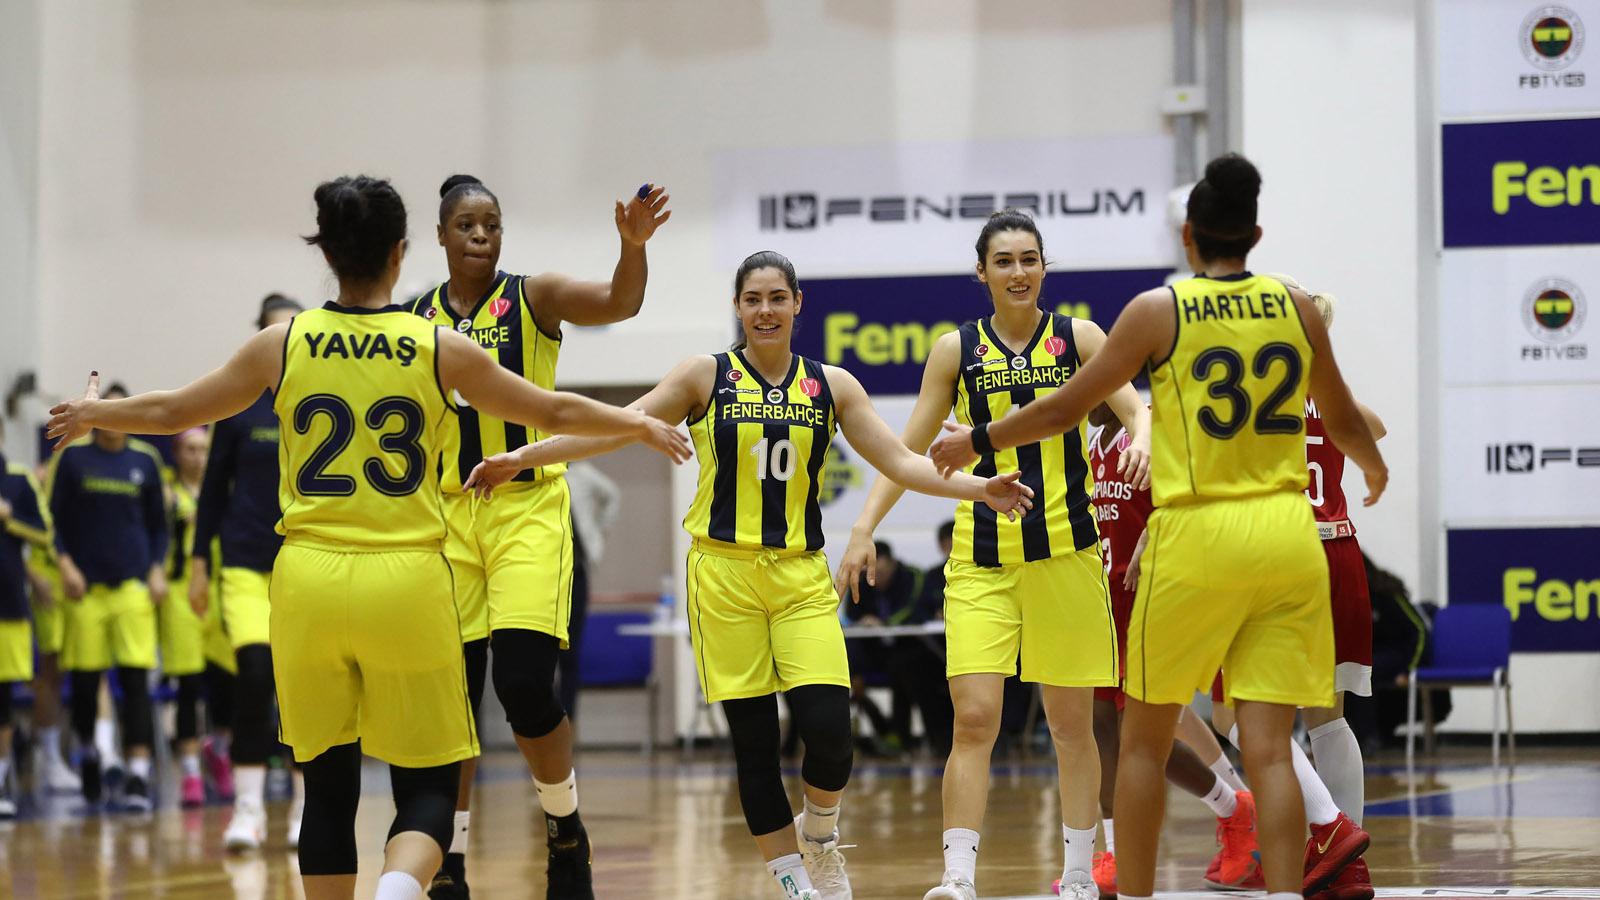 OGM Ormanspor 73-90 Fenerbahçe